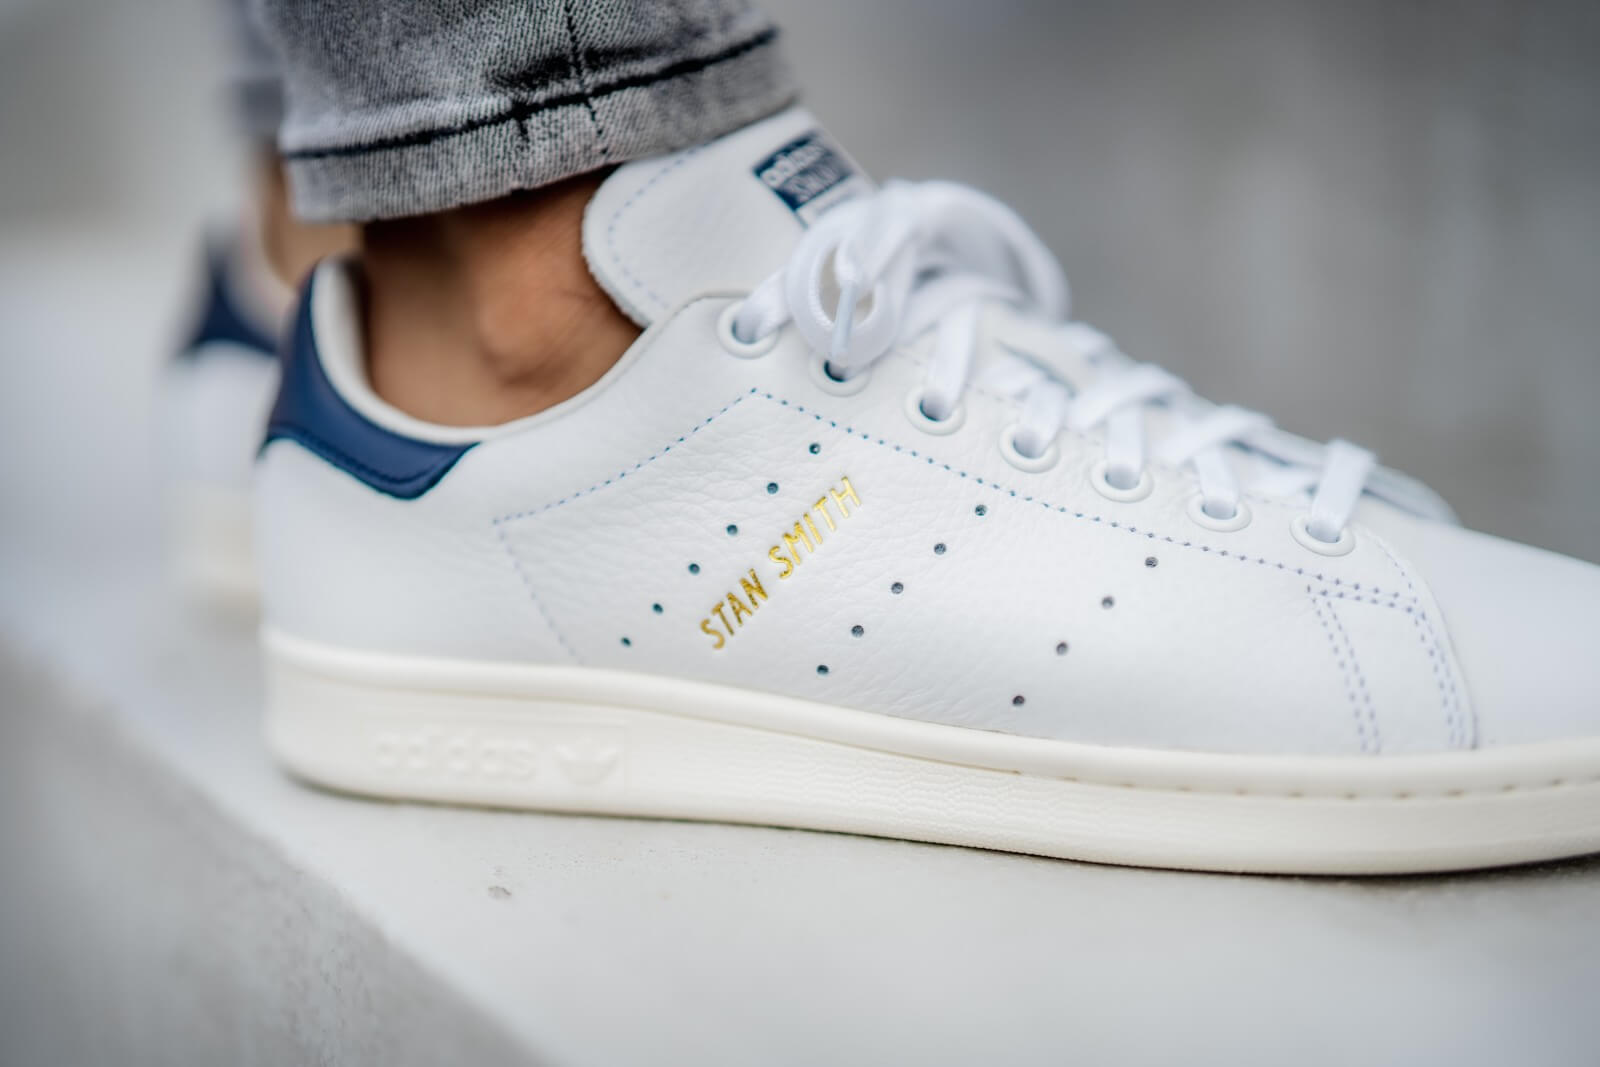 Adidas Stan Smith Footwear White/Noble